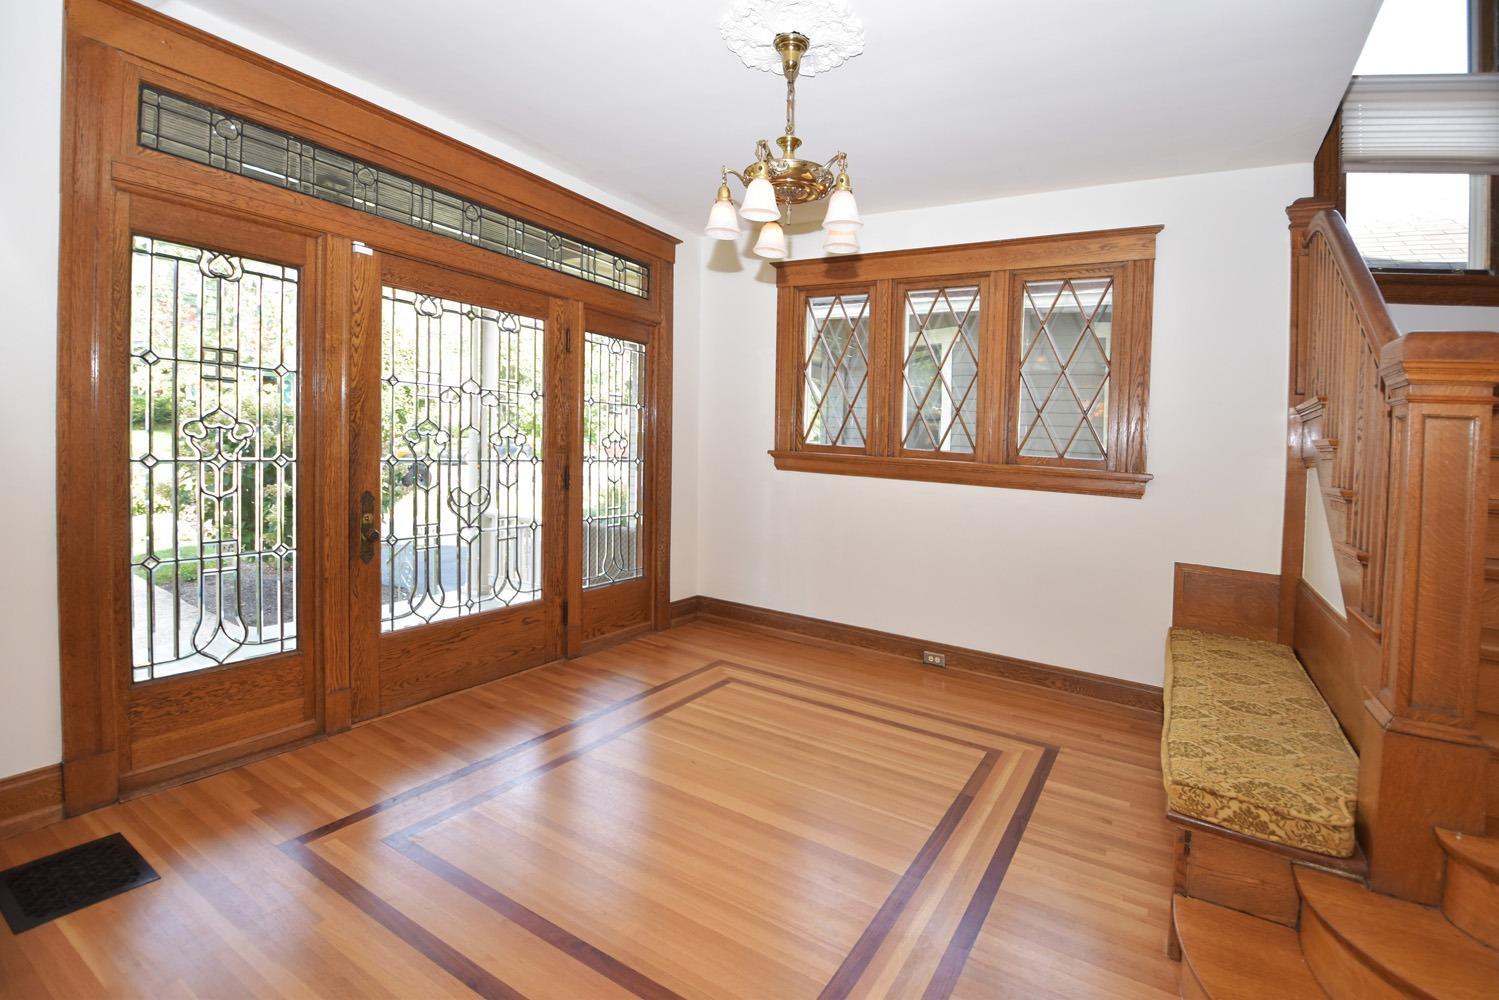 Property for sale at 3434 Mooney Avenue, Cincinnati,  OH 45208